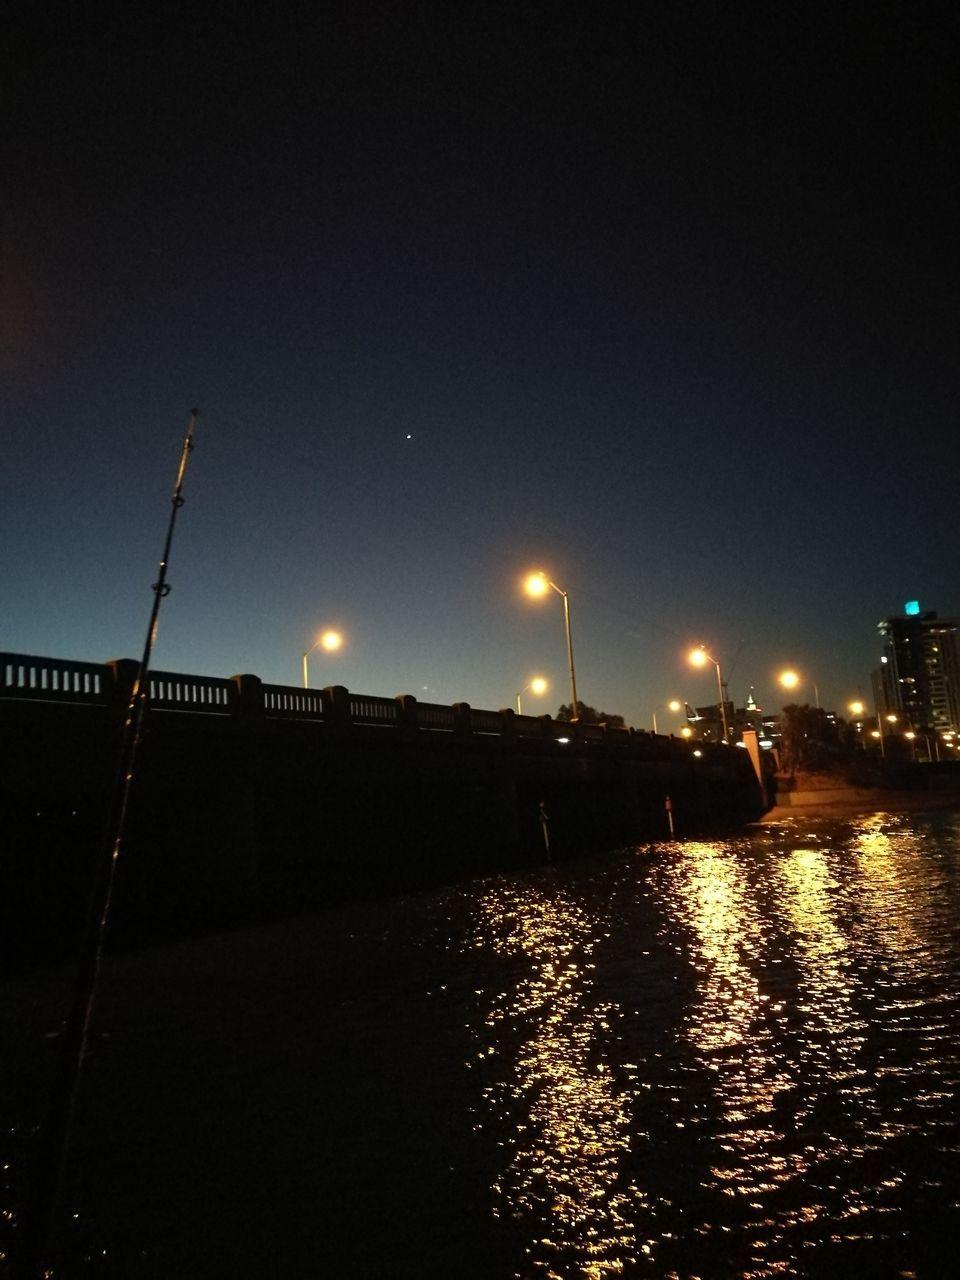 night, illuminated, no people, outdoors, street light, moon, sky, clear sky, architecture